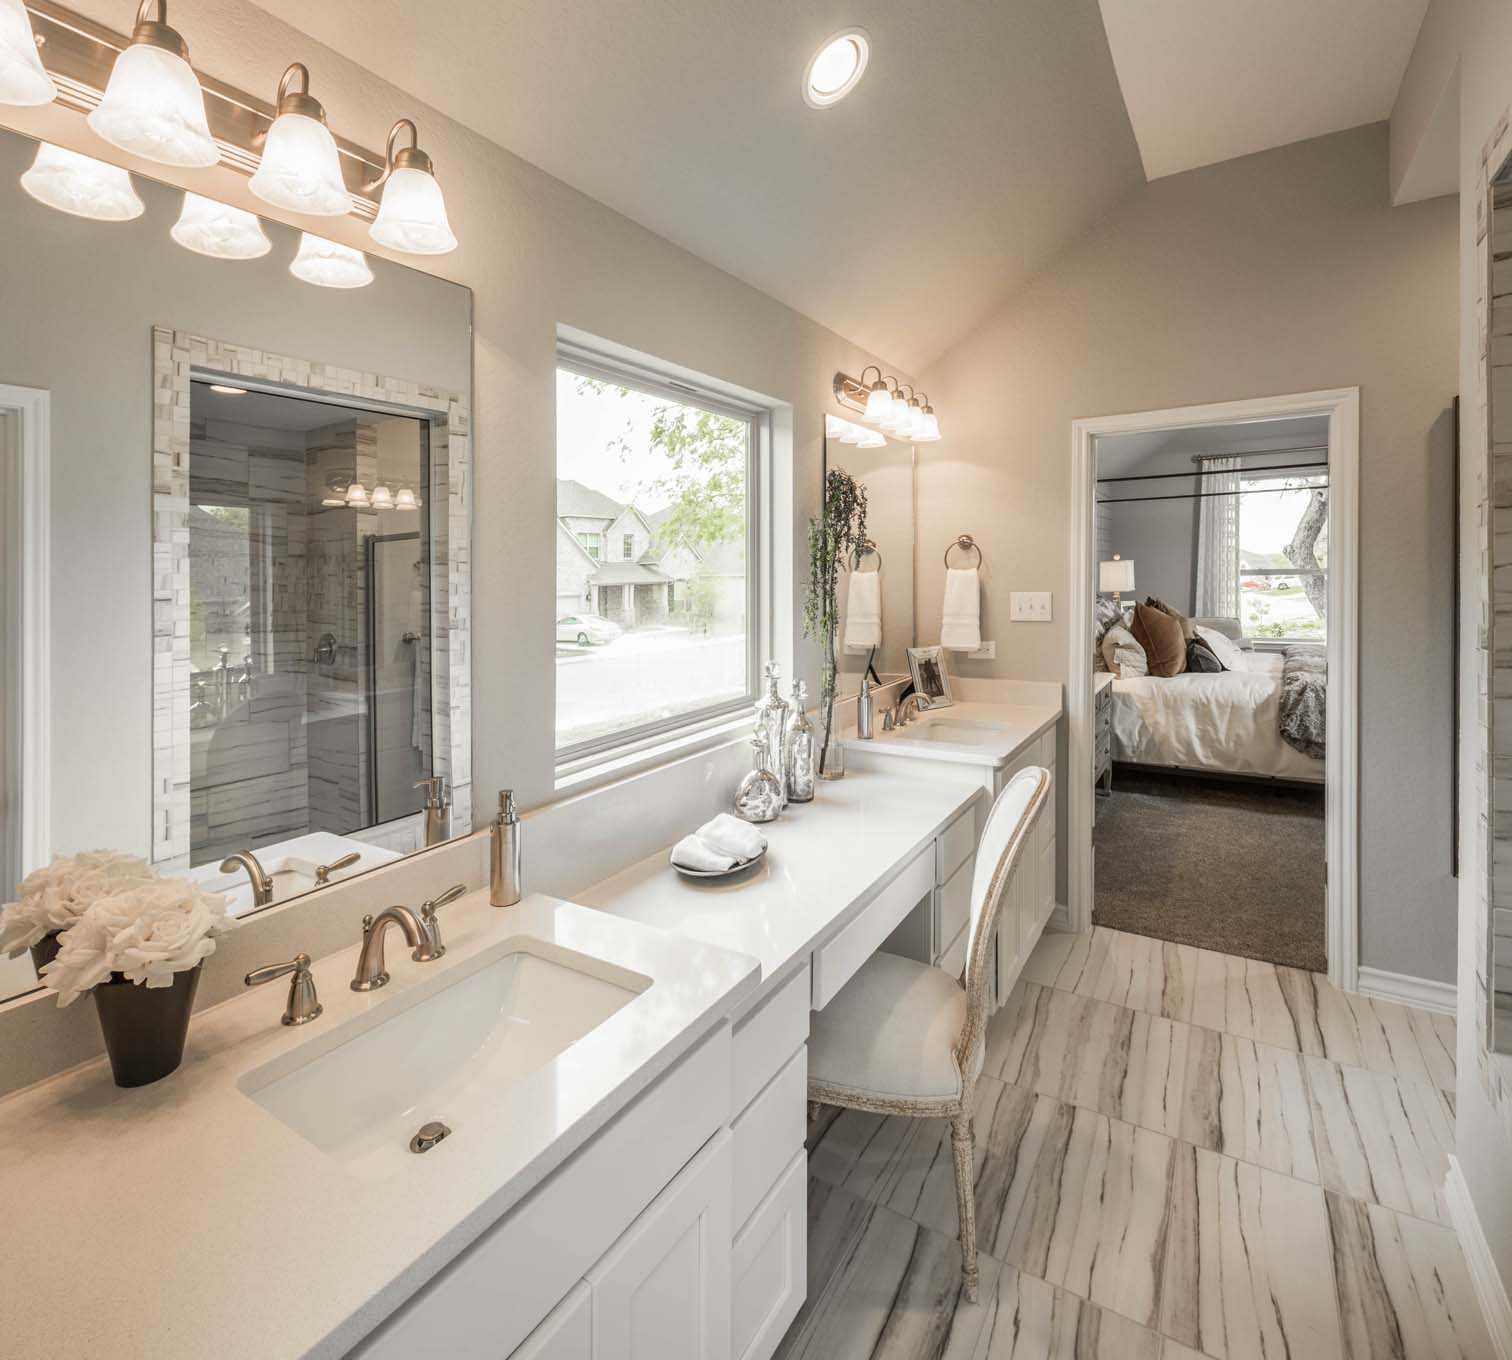 Model Home In San Antonio Texas Coronado Community: Model Home In San Antonio Texas, Balcones Creek 55s Community